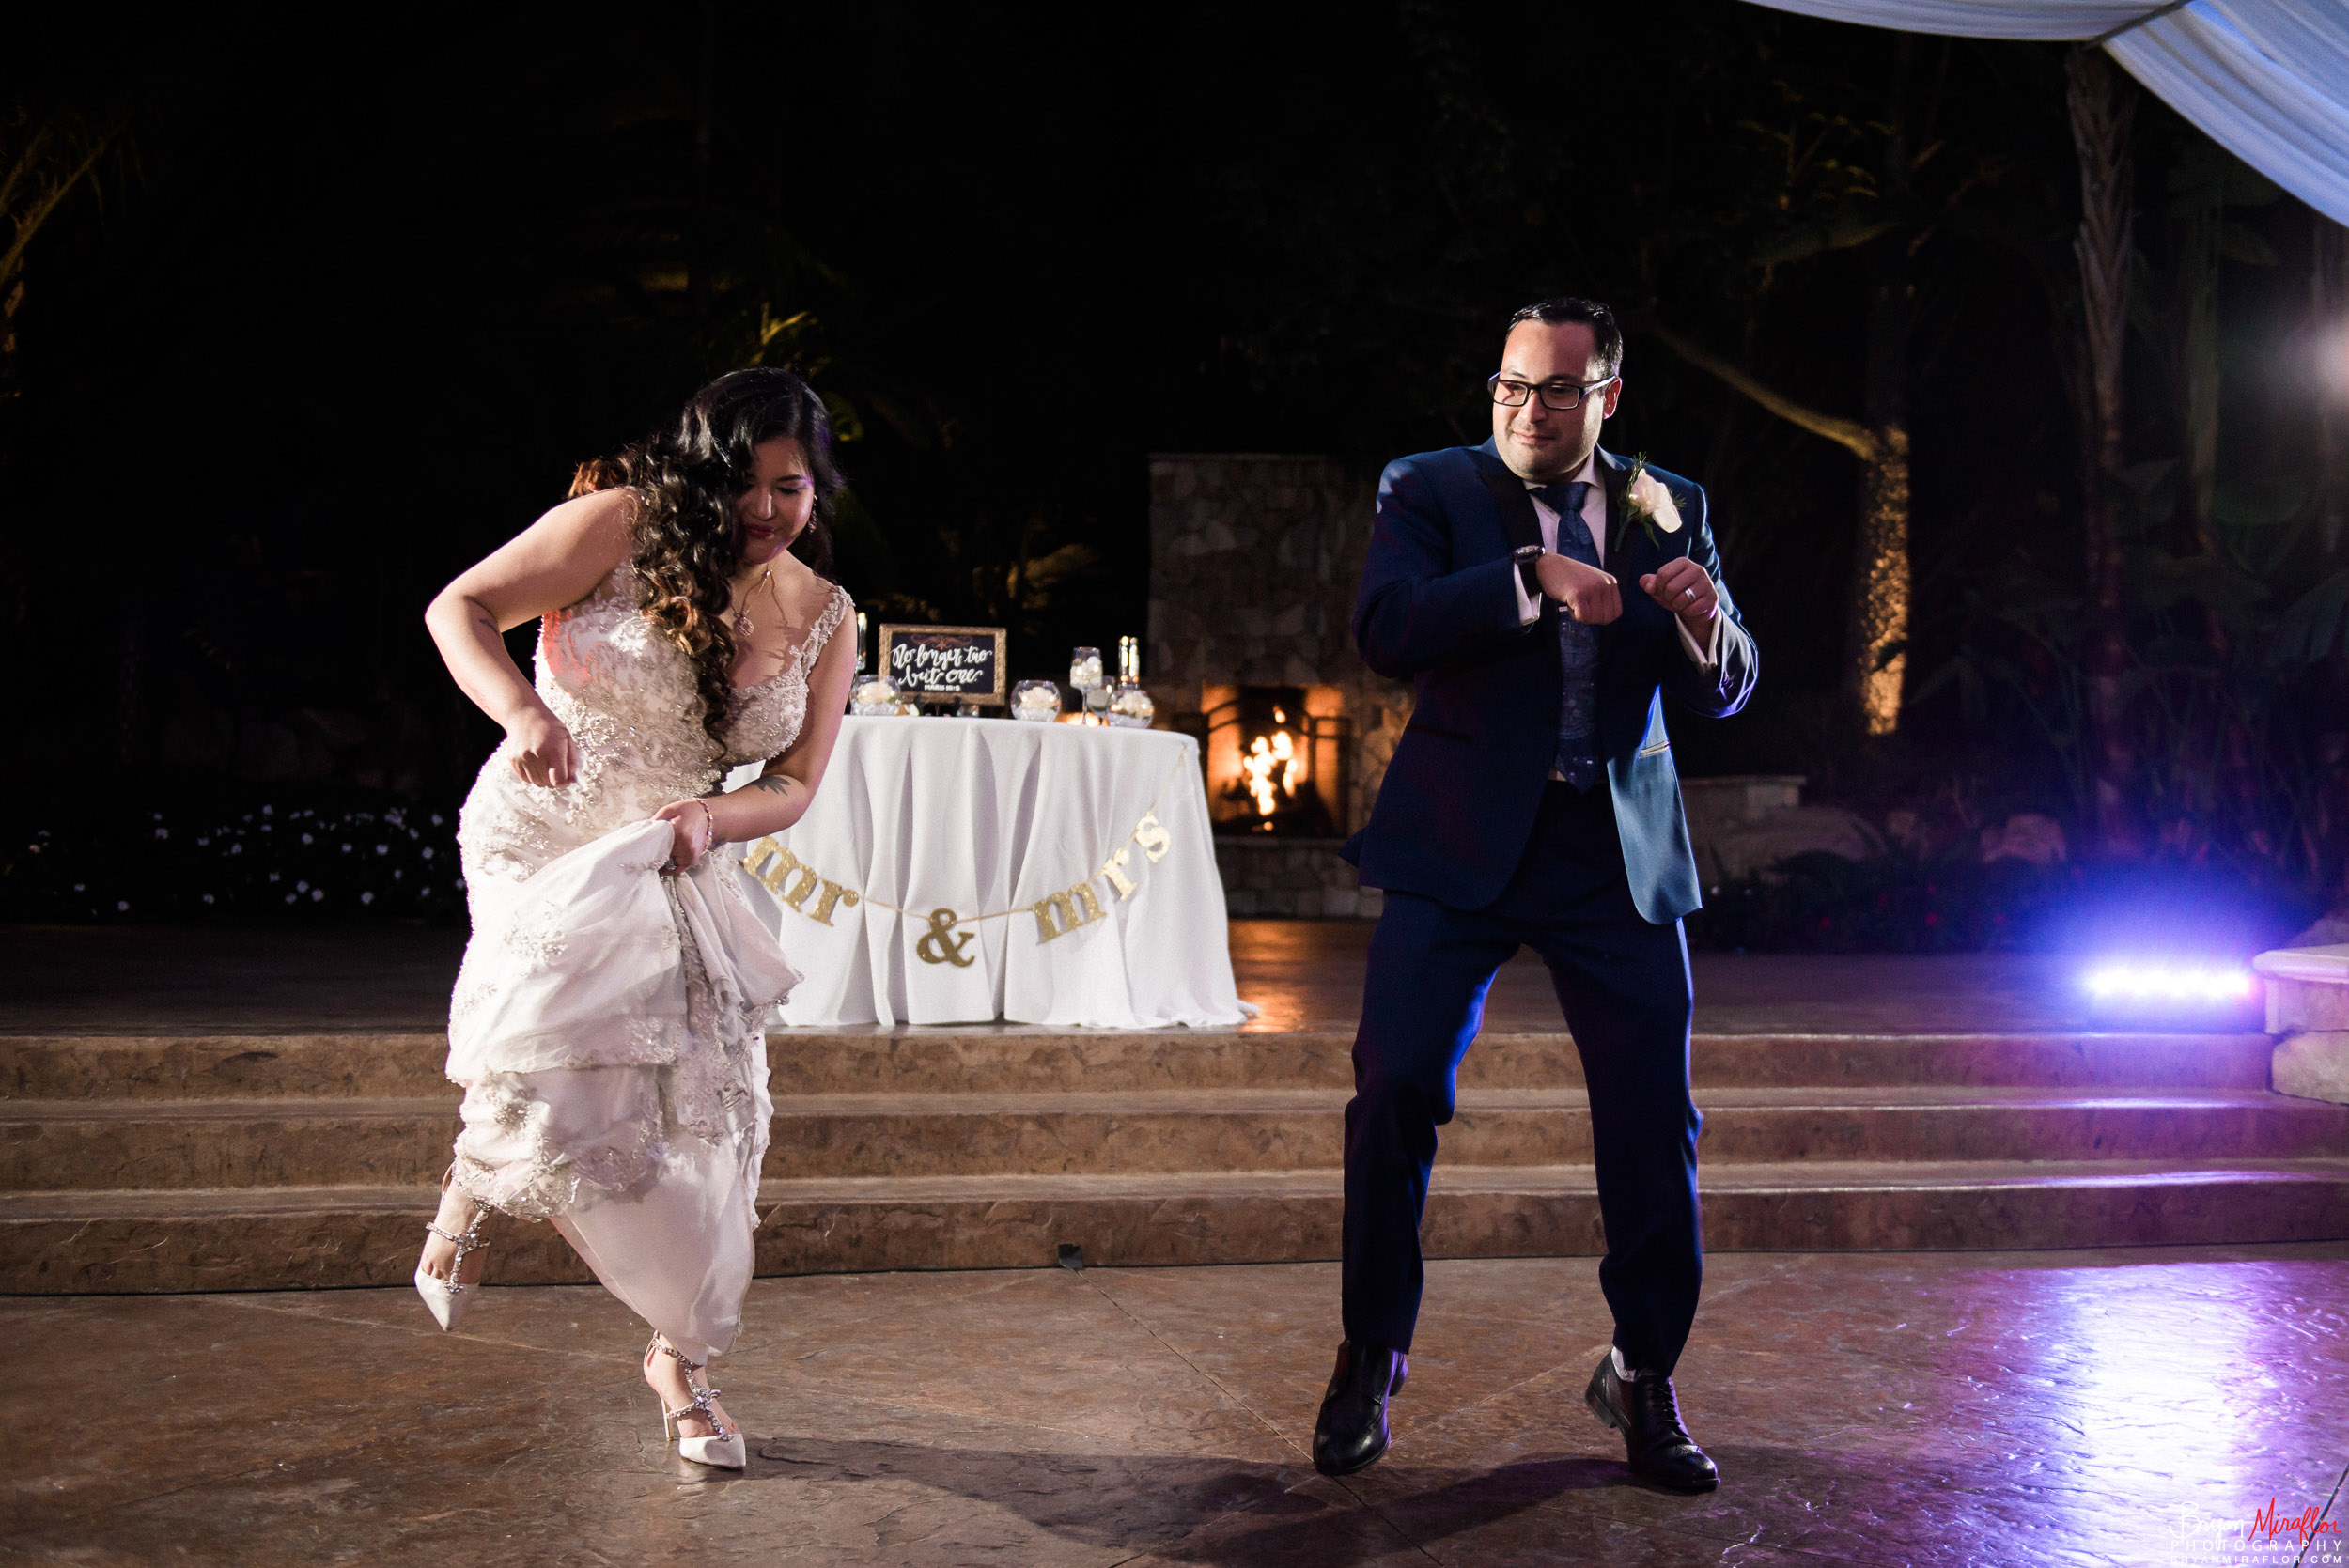 Bryan-Miraflor-Photography-Hannah-Jonathan-Married-Grand-Traditions-Estate-Gardens-Fallbrook-20171222-218.jpg